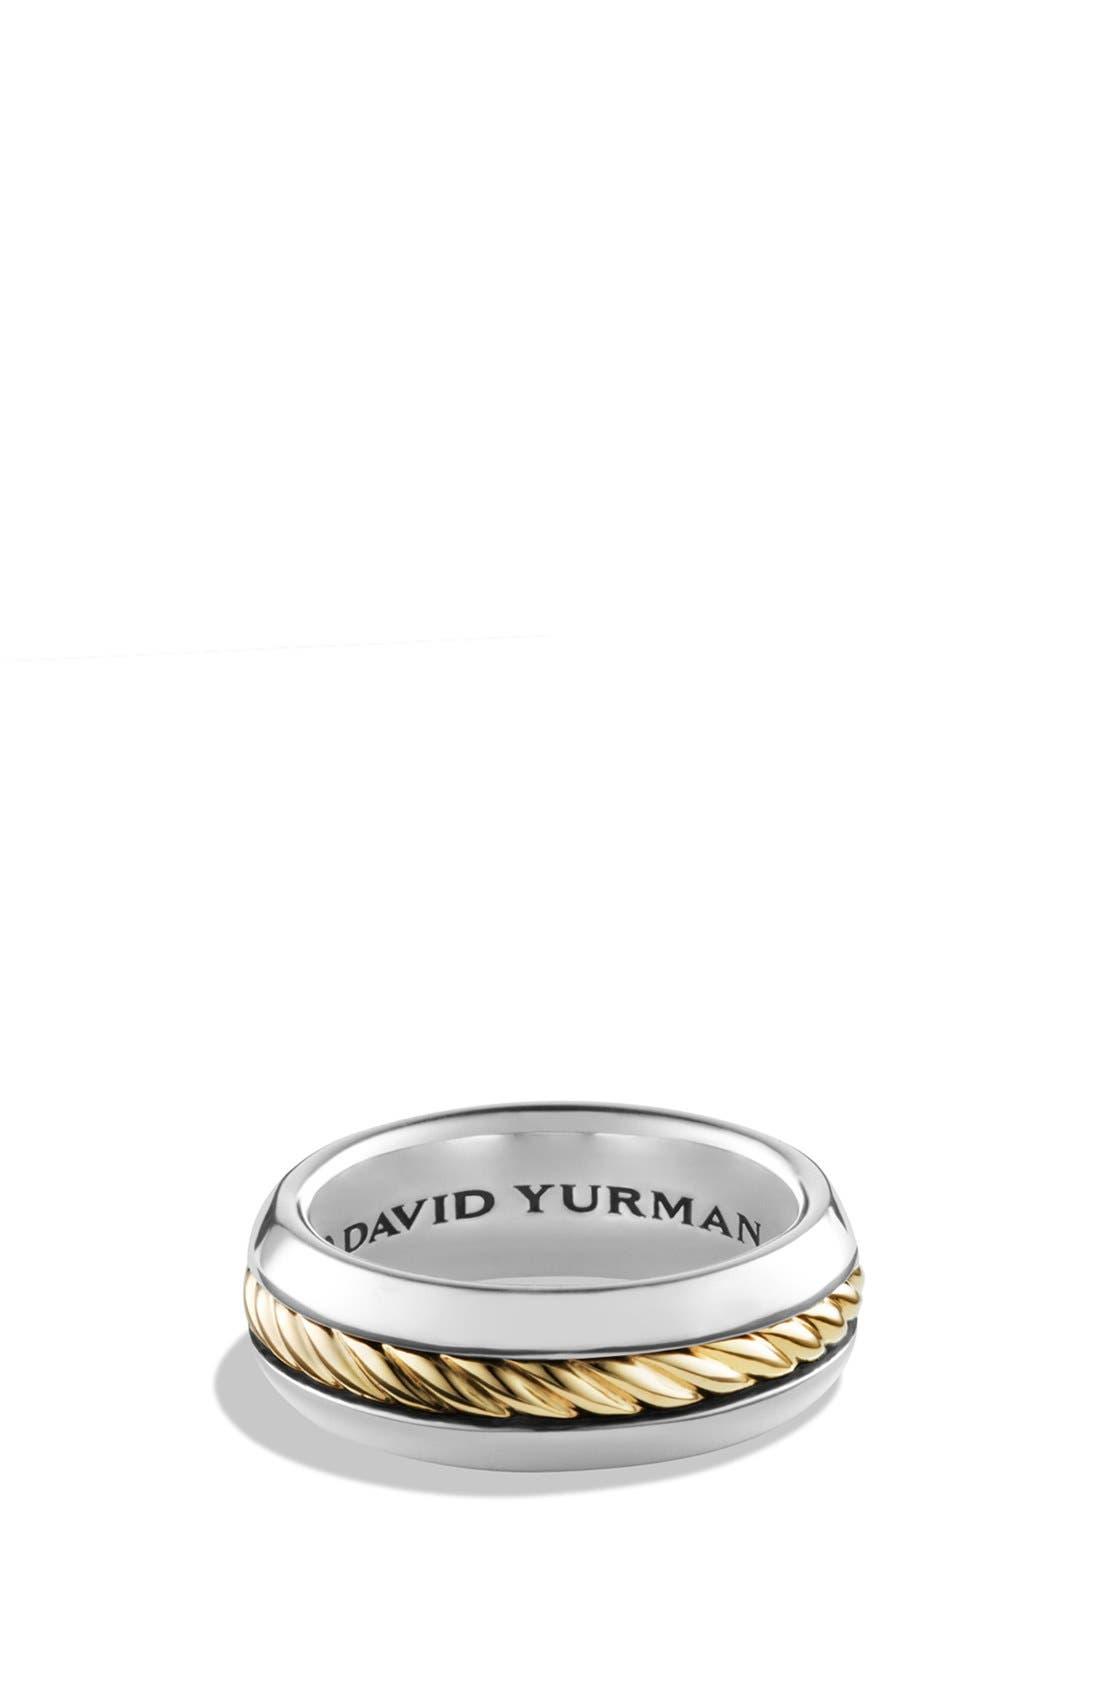 David Yurman'Cable Classics' Band Ring with 18K Gold